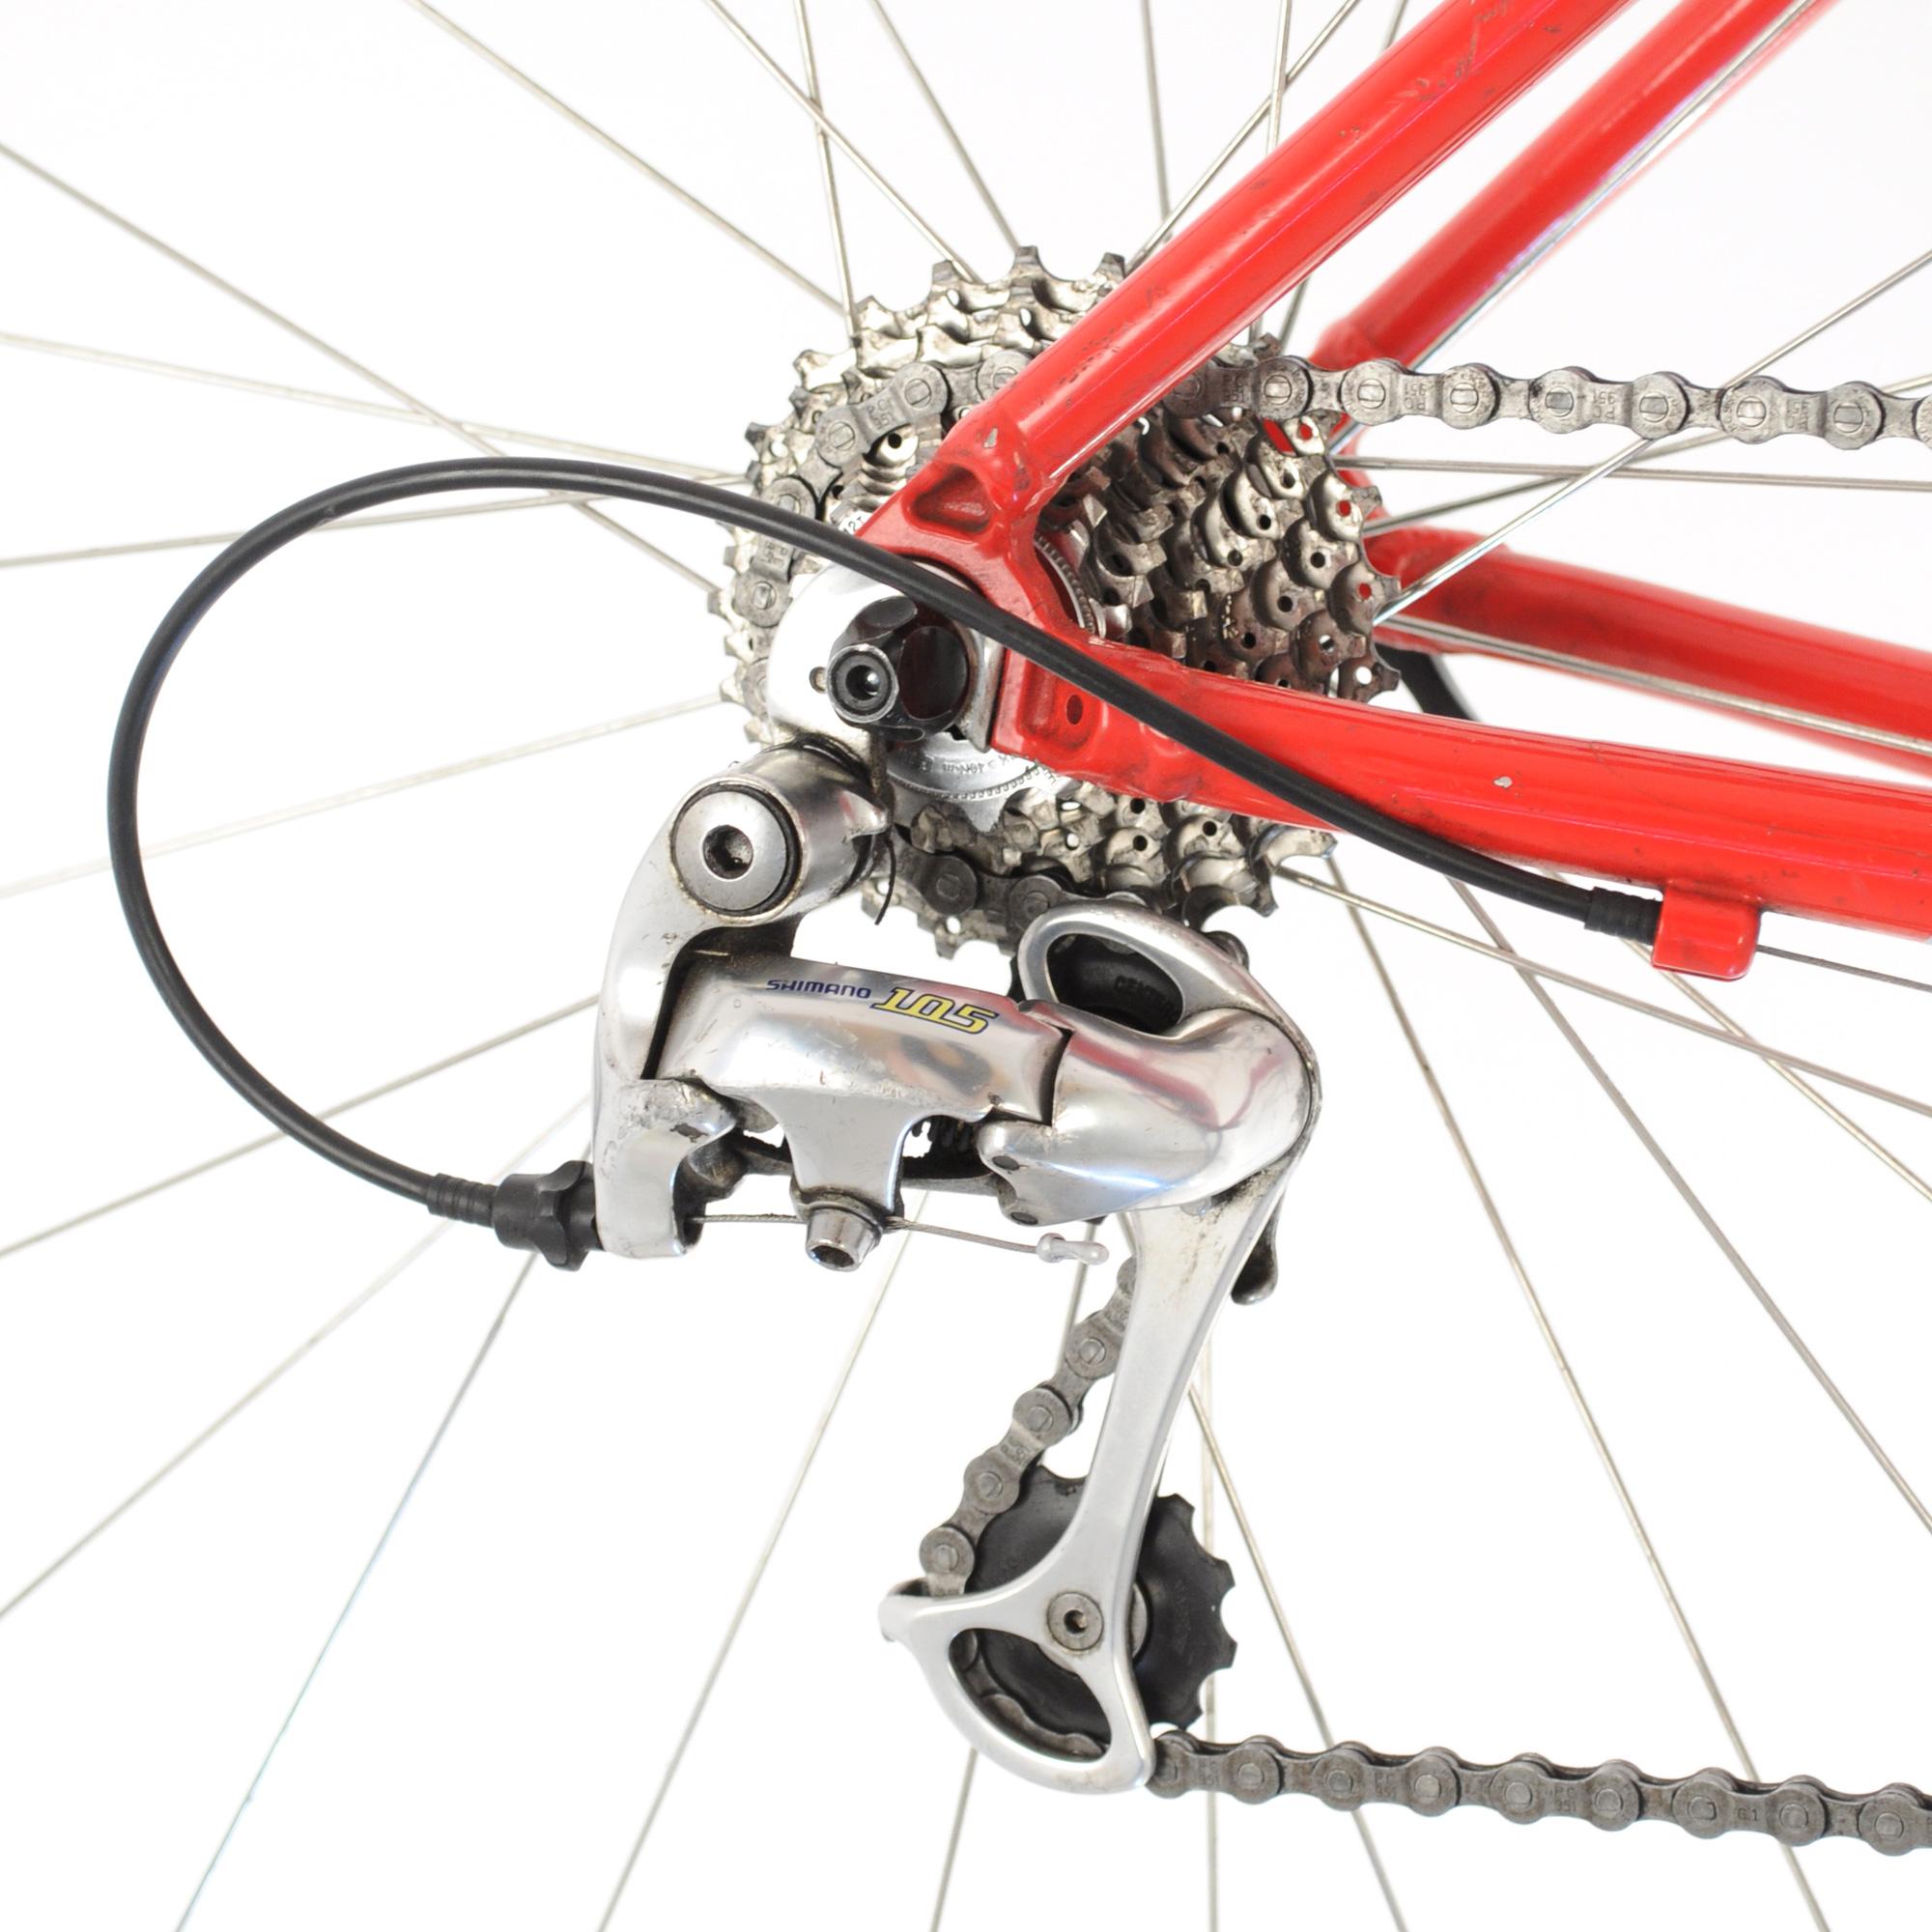 61a1067570e Schwinn Fastback Comp - 43cm - Wheel & Sprocket | One of America's Best  Bike Shops